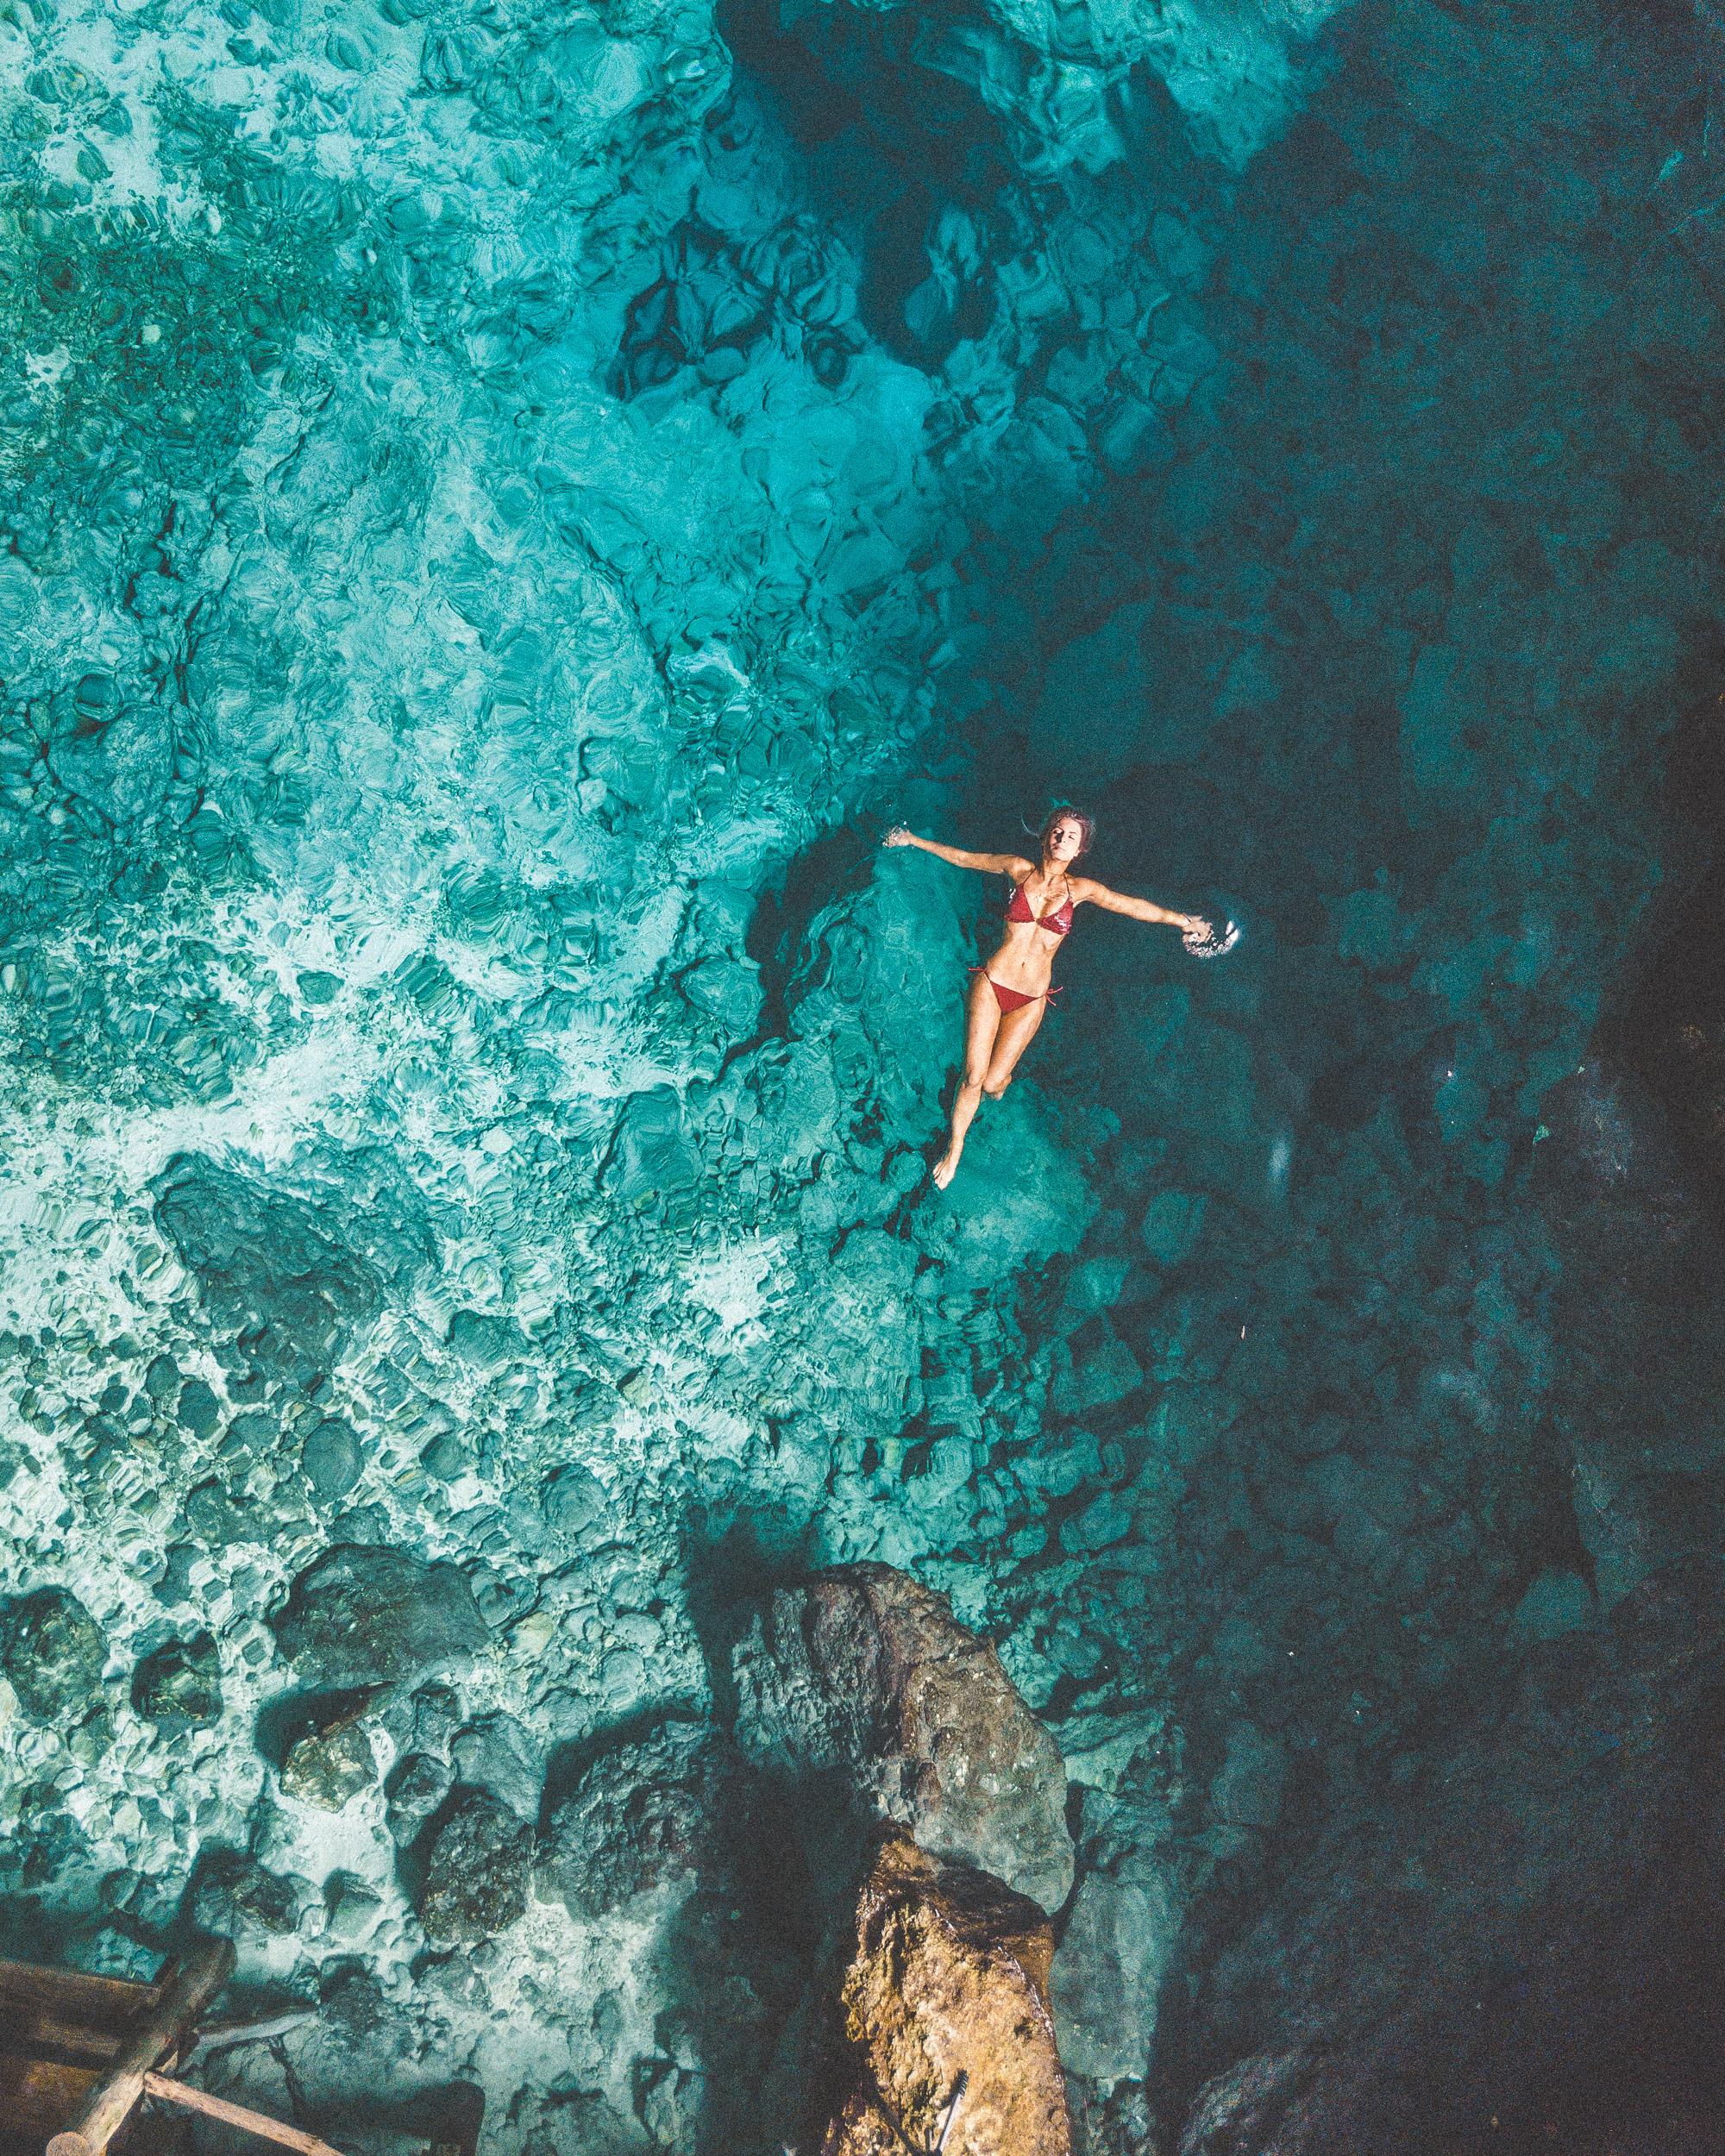 Swimming in Hoyo Azul (Blue Hole), Dominican Republic | Clear Blue Water in Punta Cana | Tropical Paradise Beach Getaways in the Caribbean | Islands Near North America